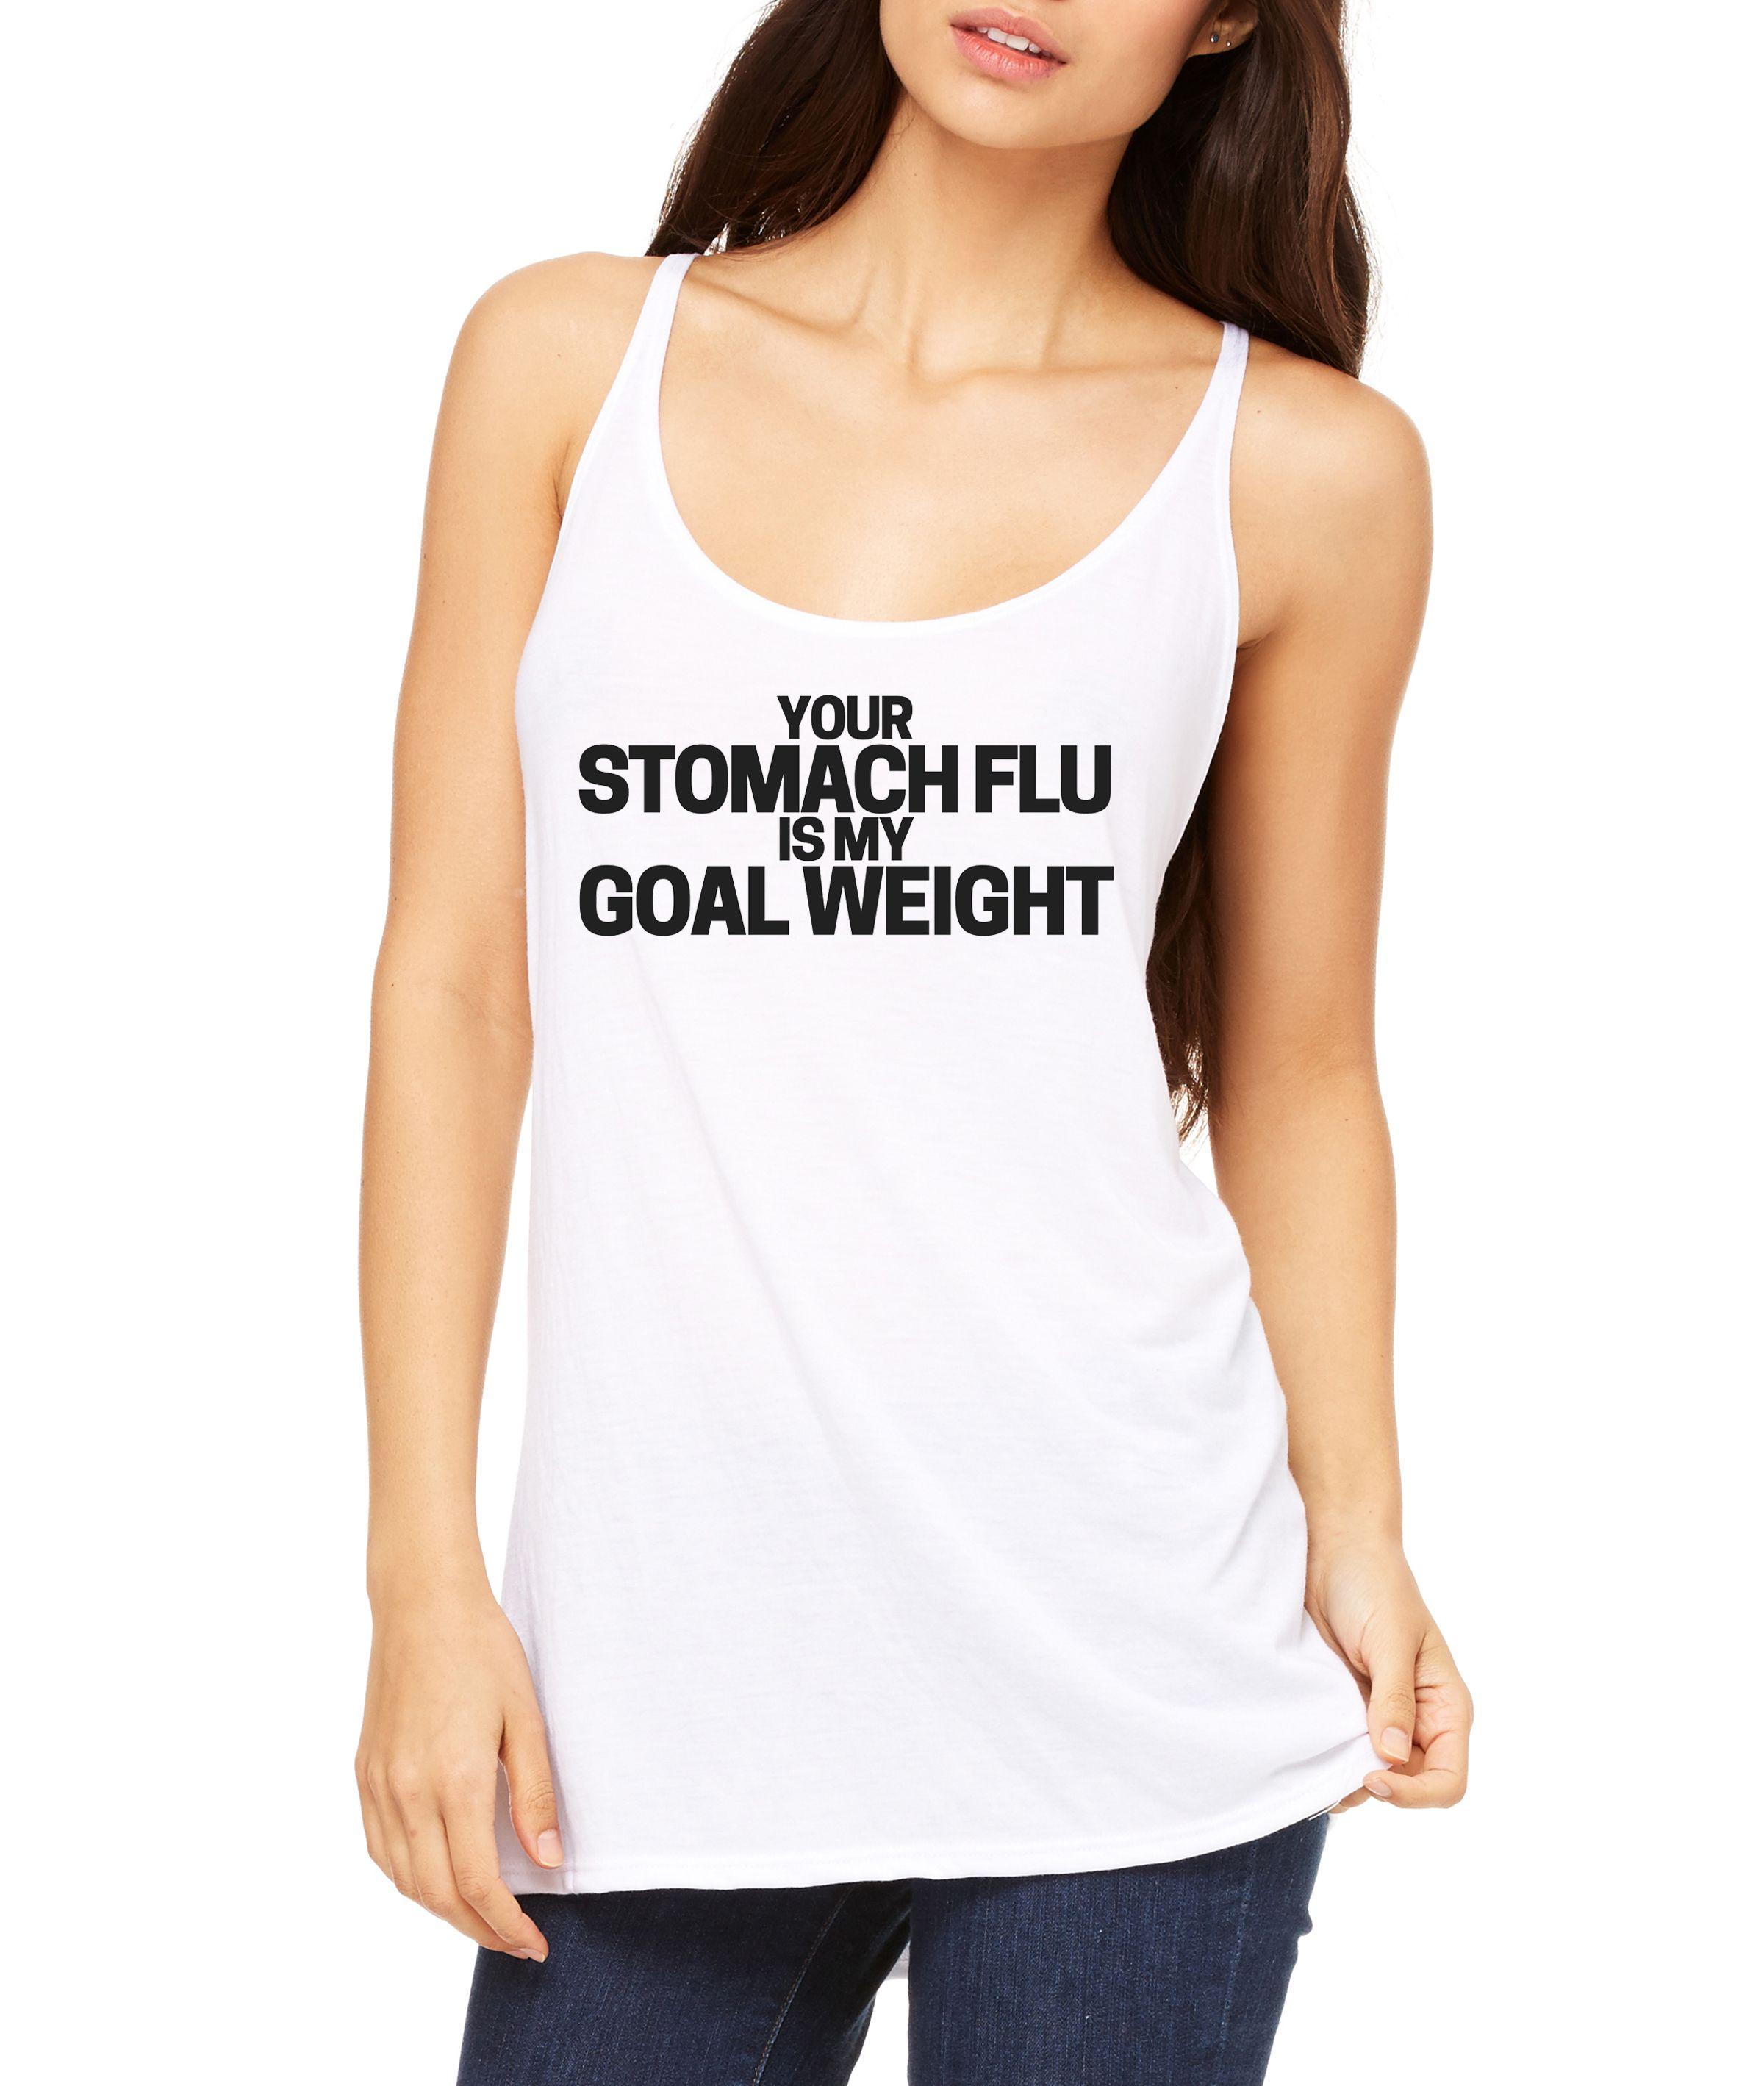 Stomach Flu Women's Slouchy Tank